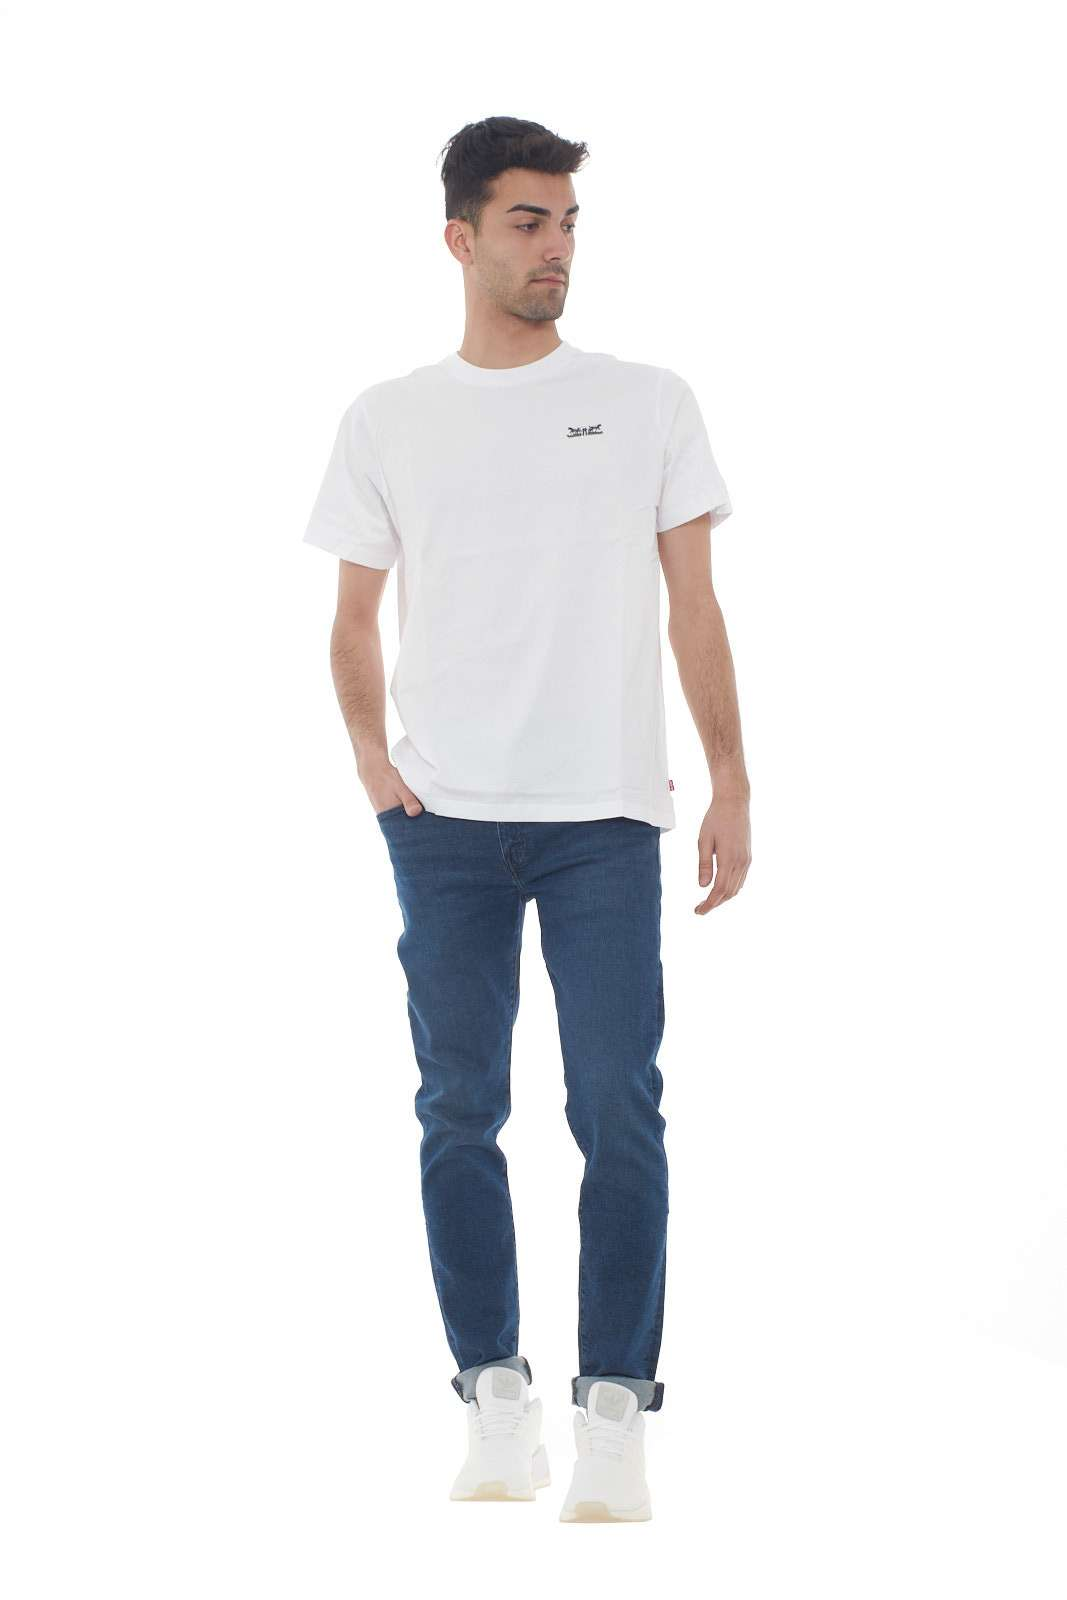 https://www.parmax.com/media/catalog/product/a/i/PE-outlet_parmax-t-shirt-uomo-Levis-699780032-D_1.jpg